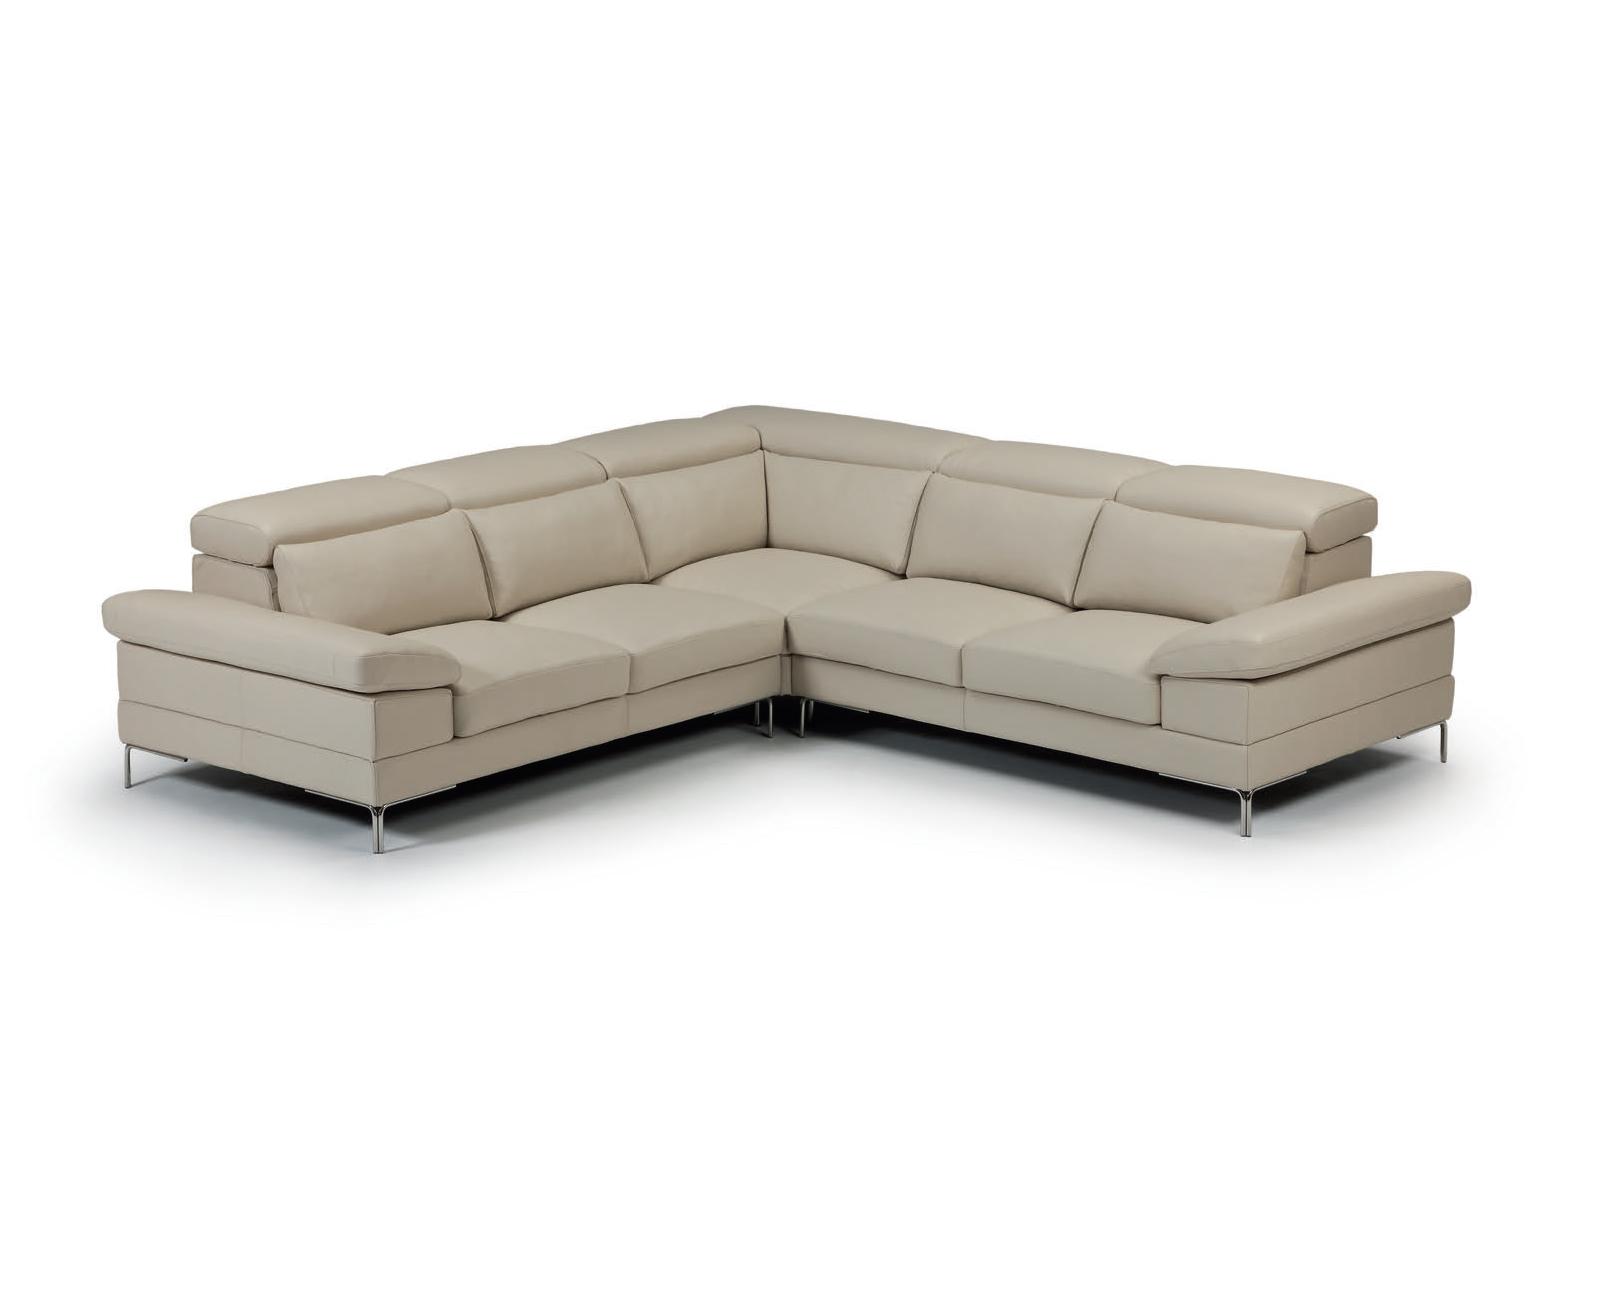 Margot divano angolare